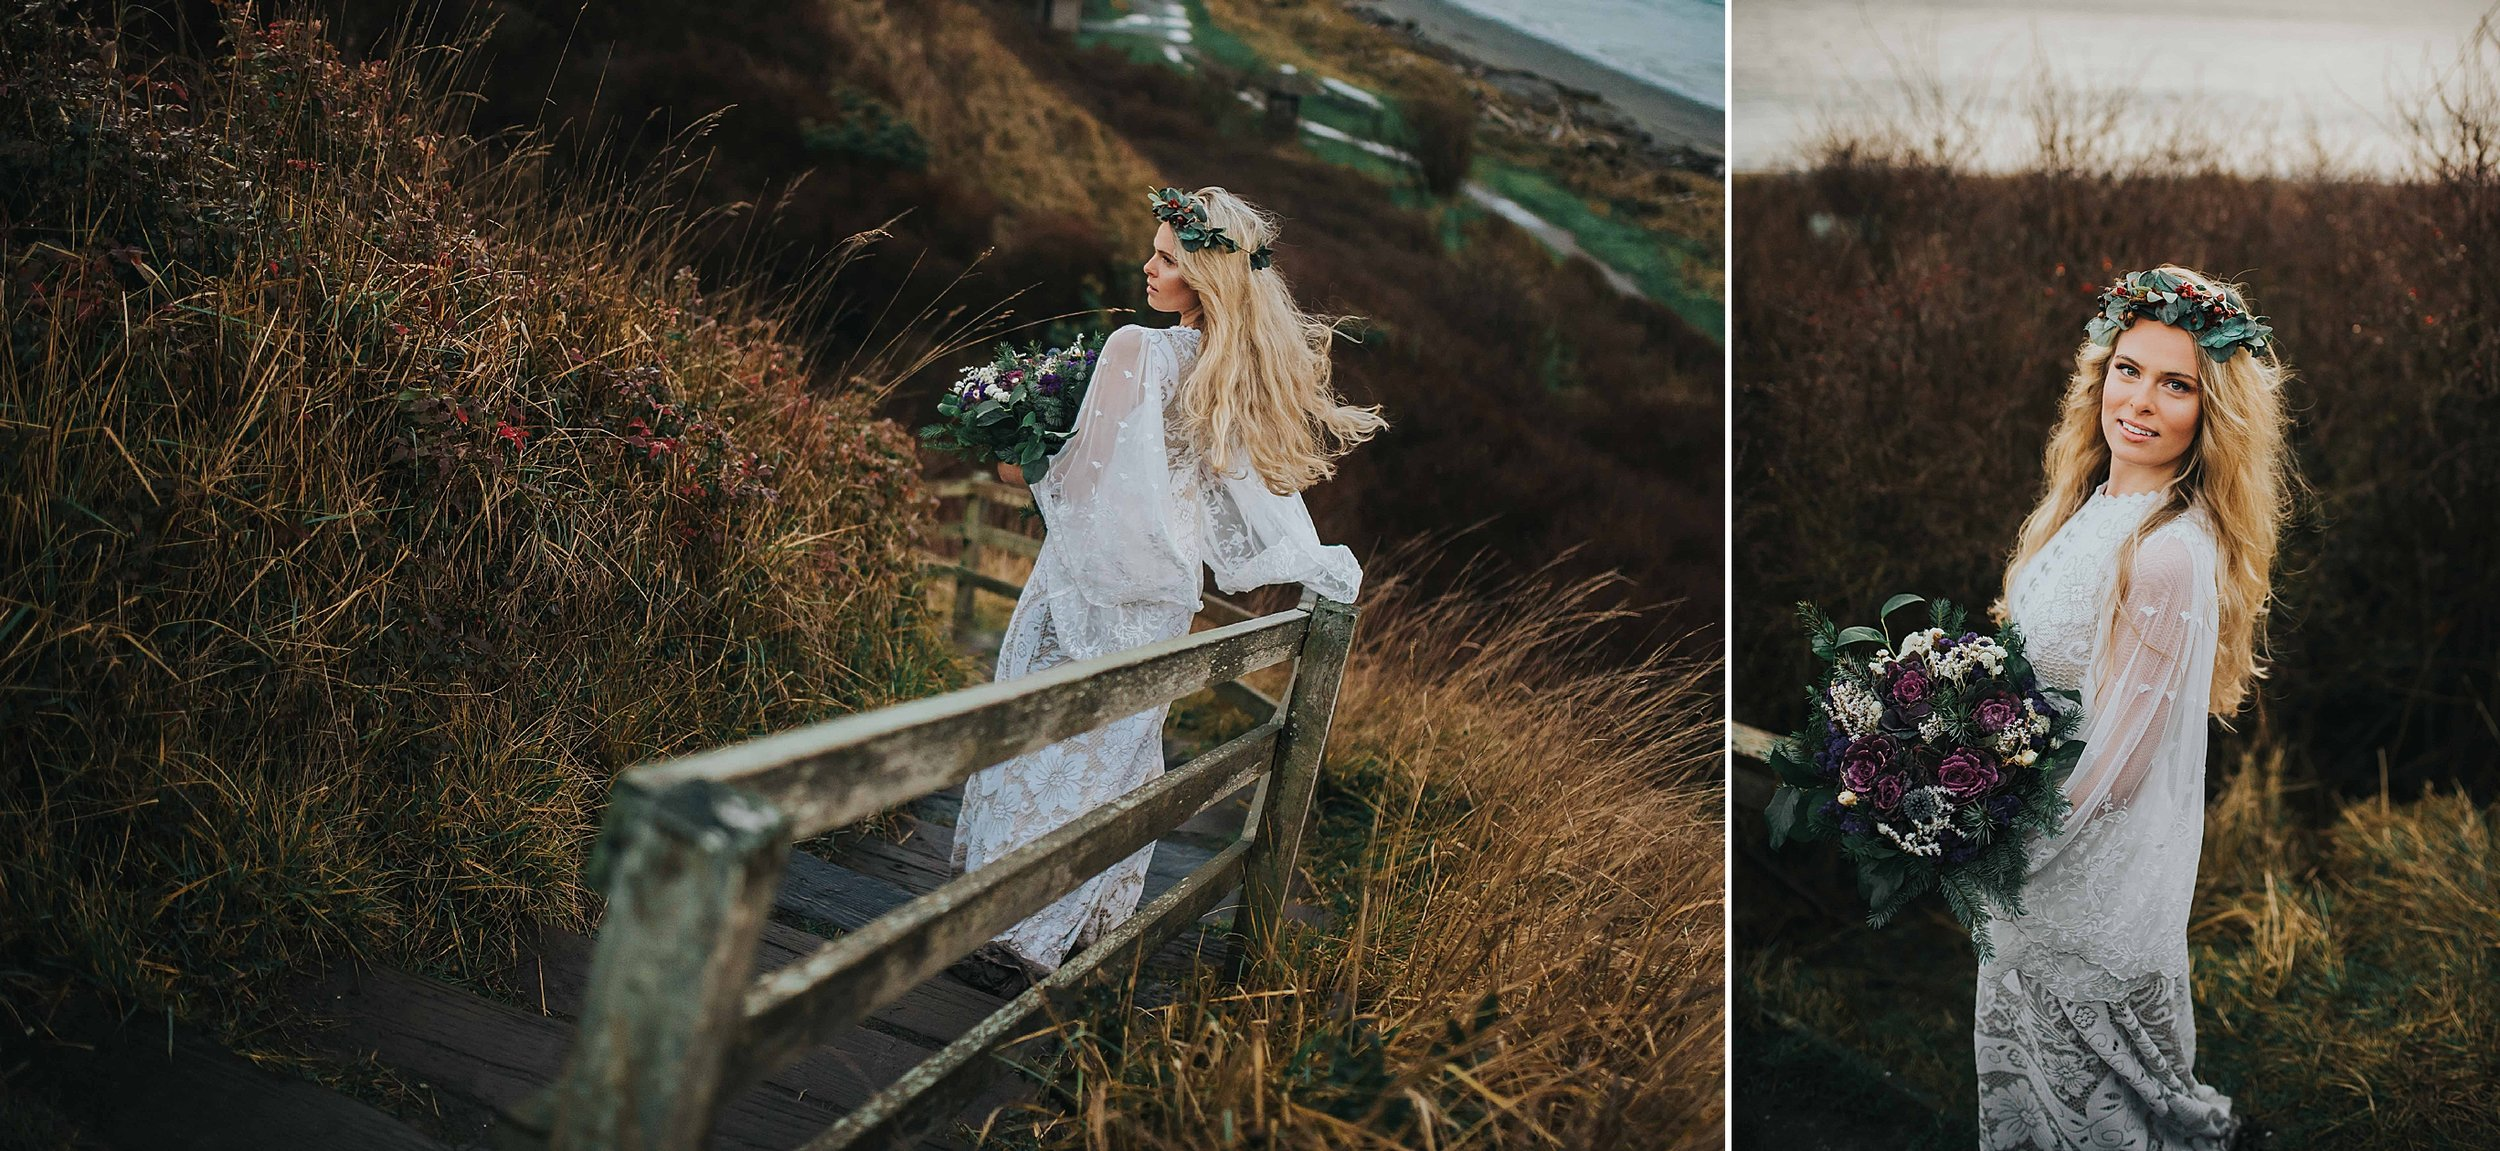 Wedding-photographer-J HODGES PHOTOGRAPHY_0225.jpg